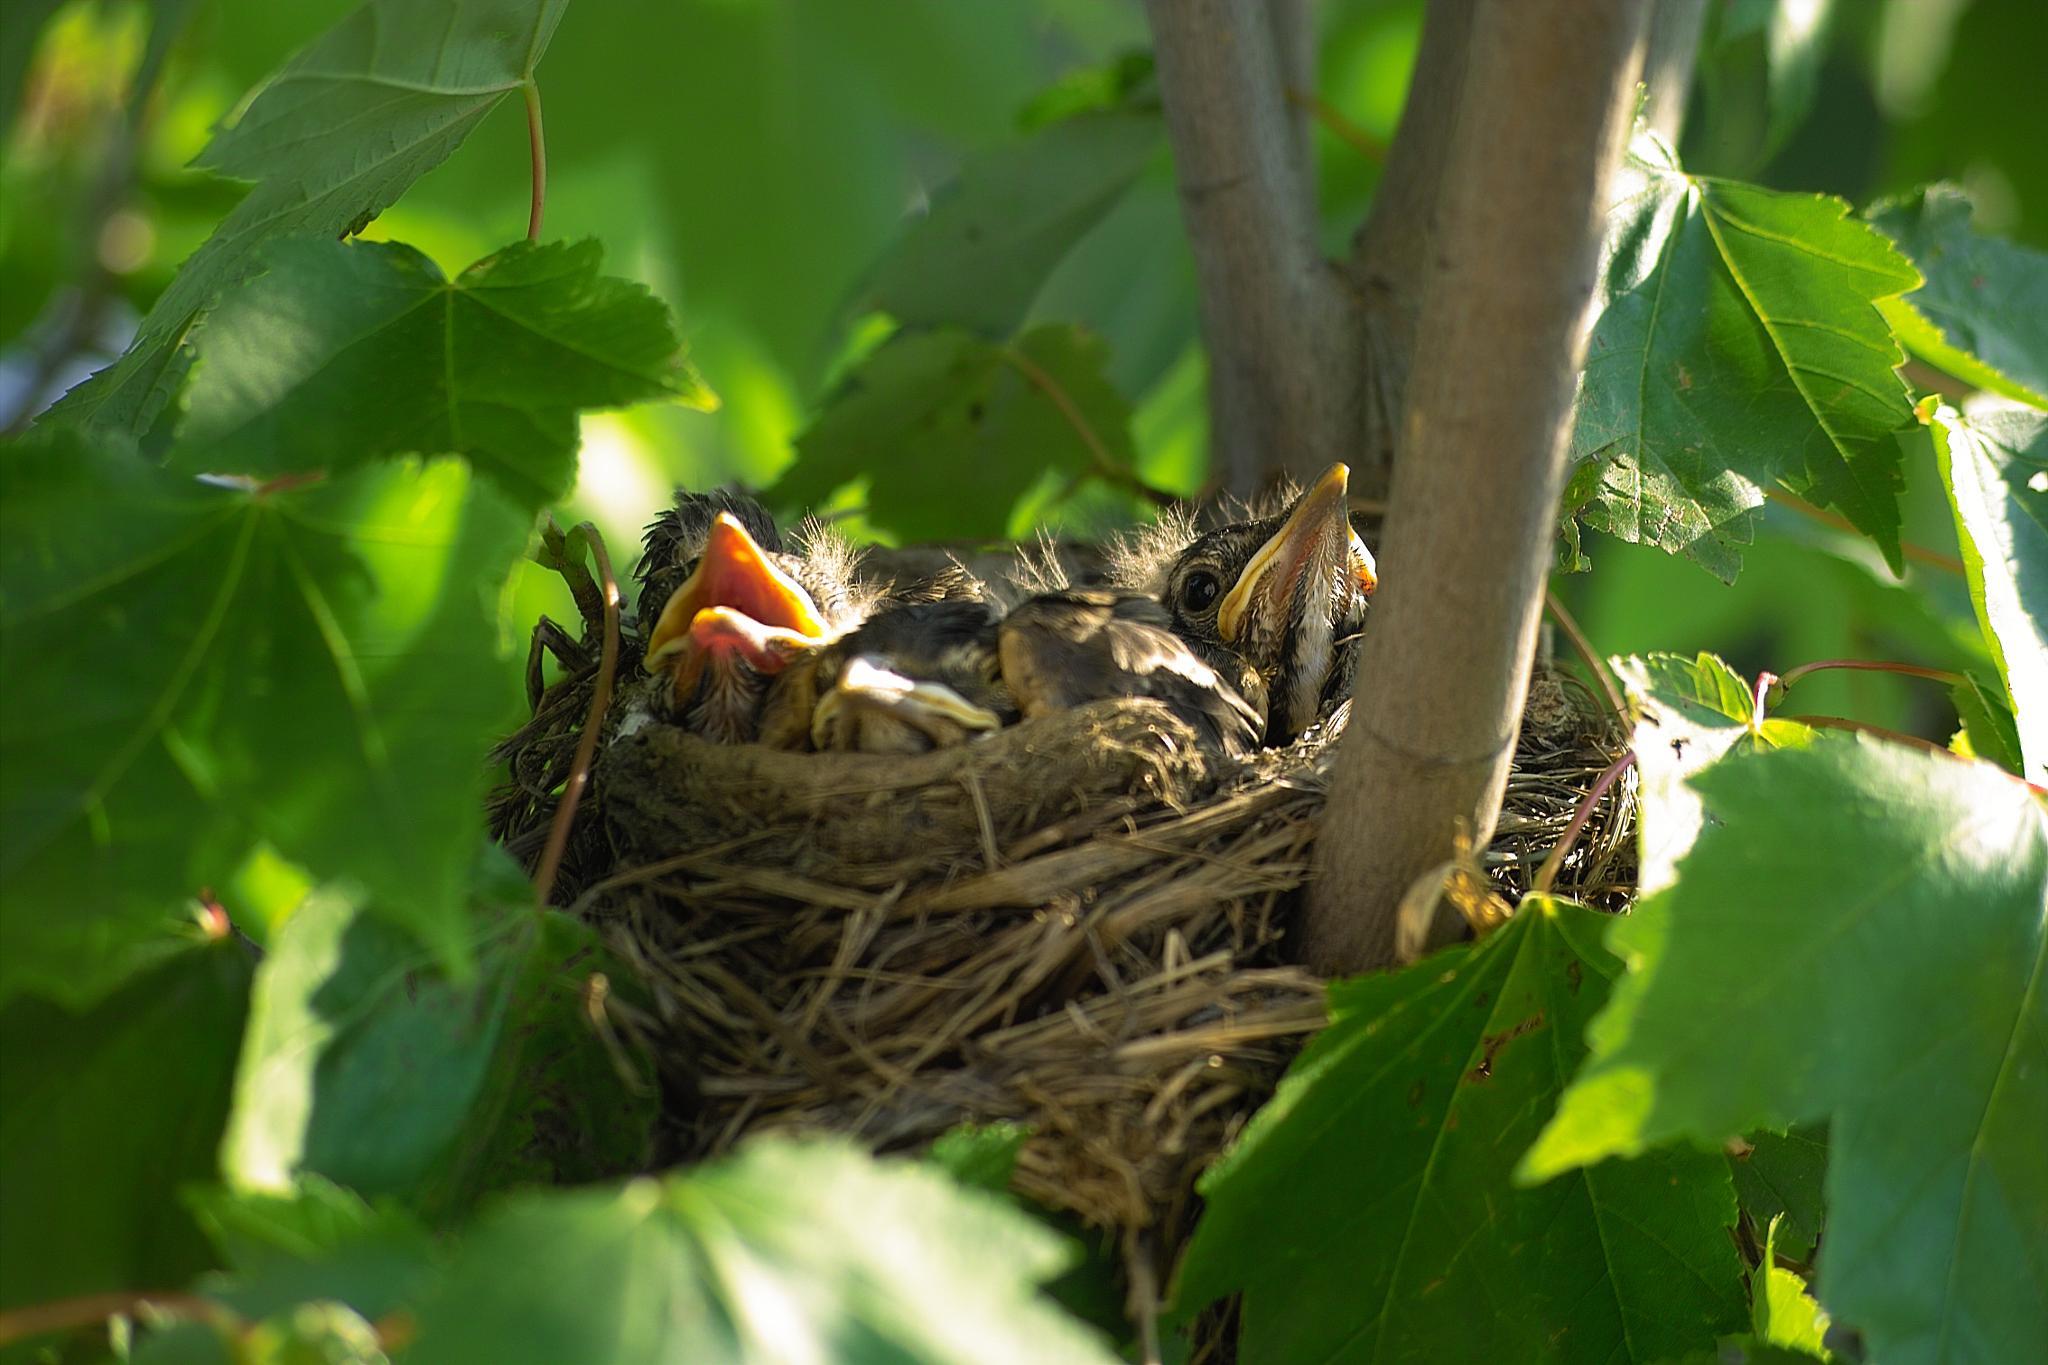 Baby Robins by munacra